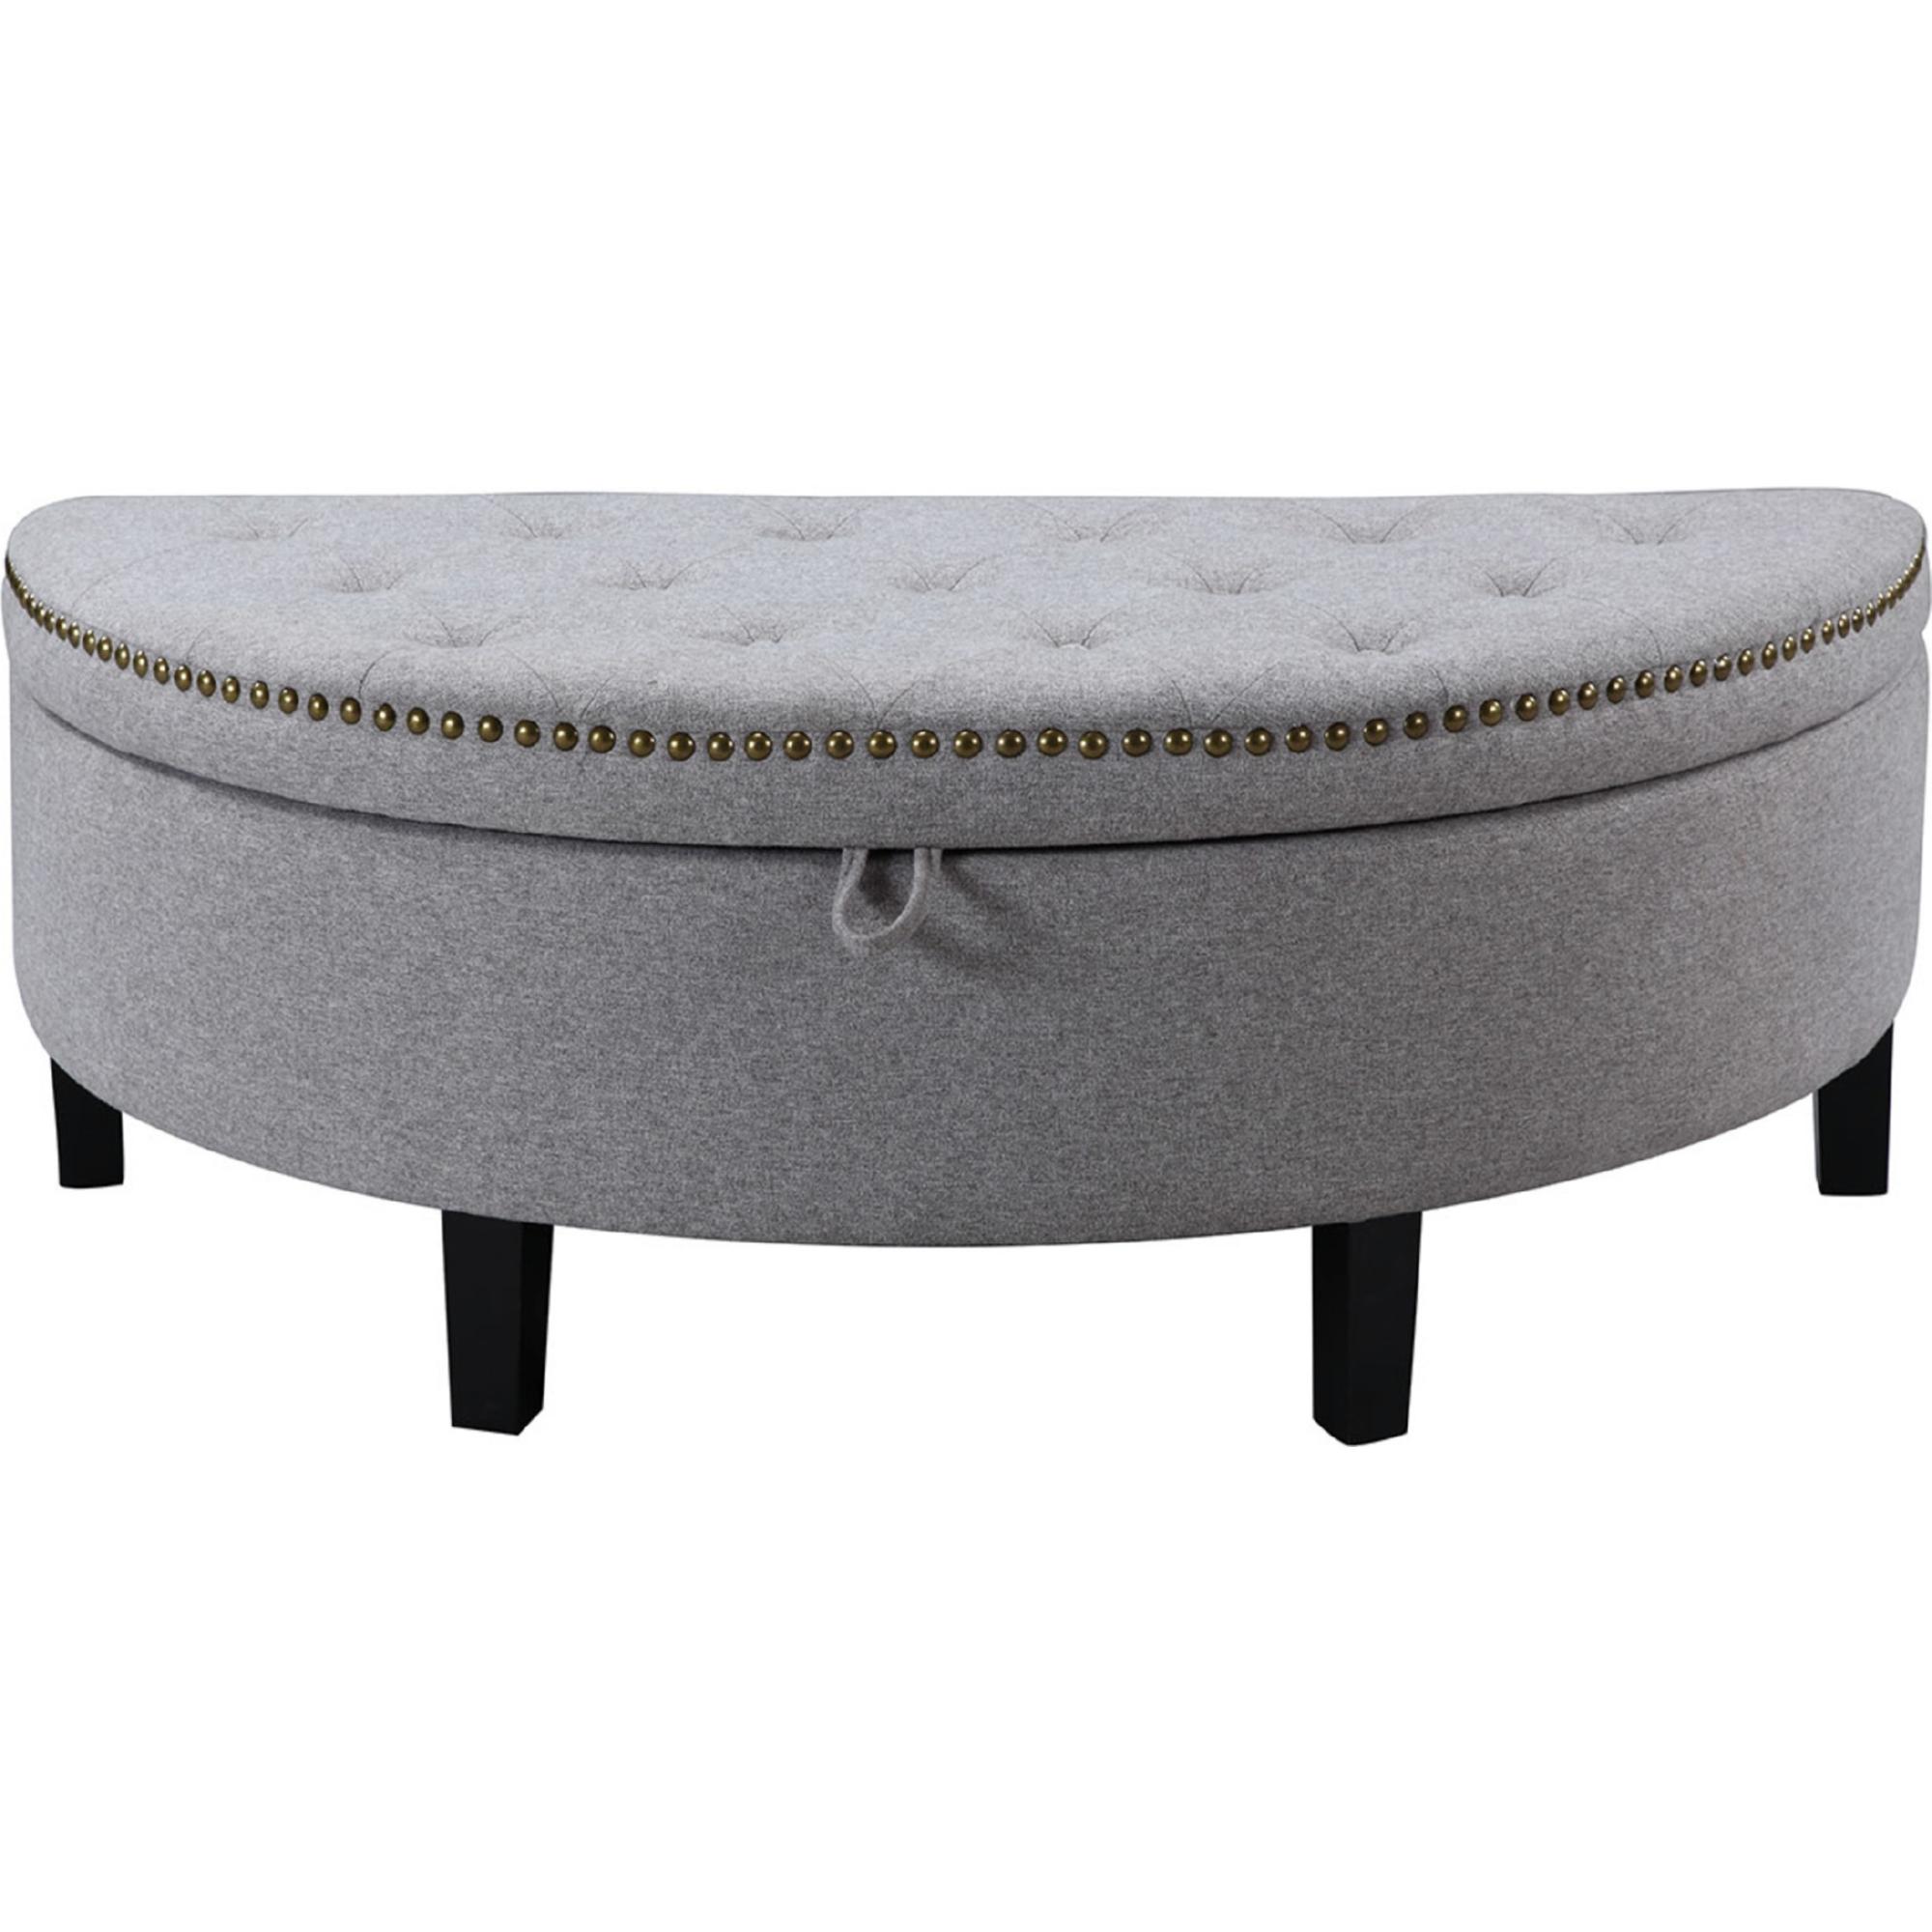 Fabulous Jacqueline Half Moon Storage Ottoman In Tufted Grey Linen W Gold Nailhead By Chic Home Customarchery Wood Chair Design Ideas Customarcherynet